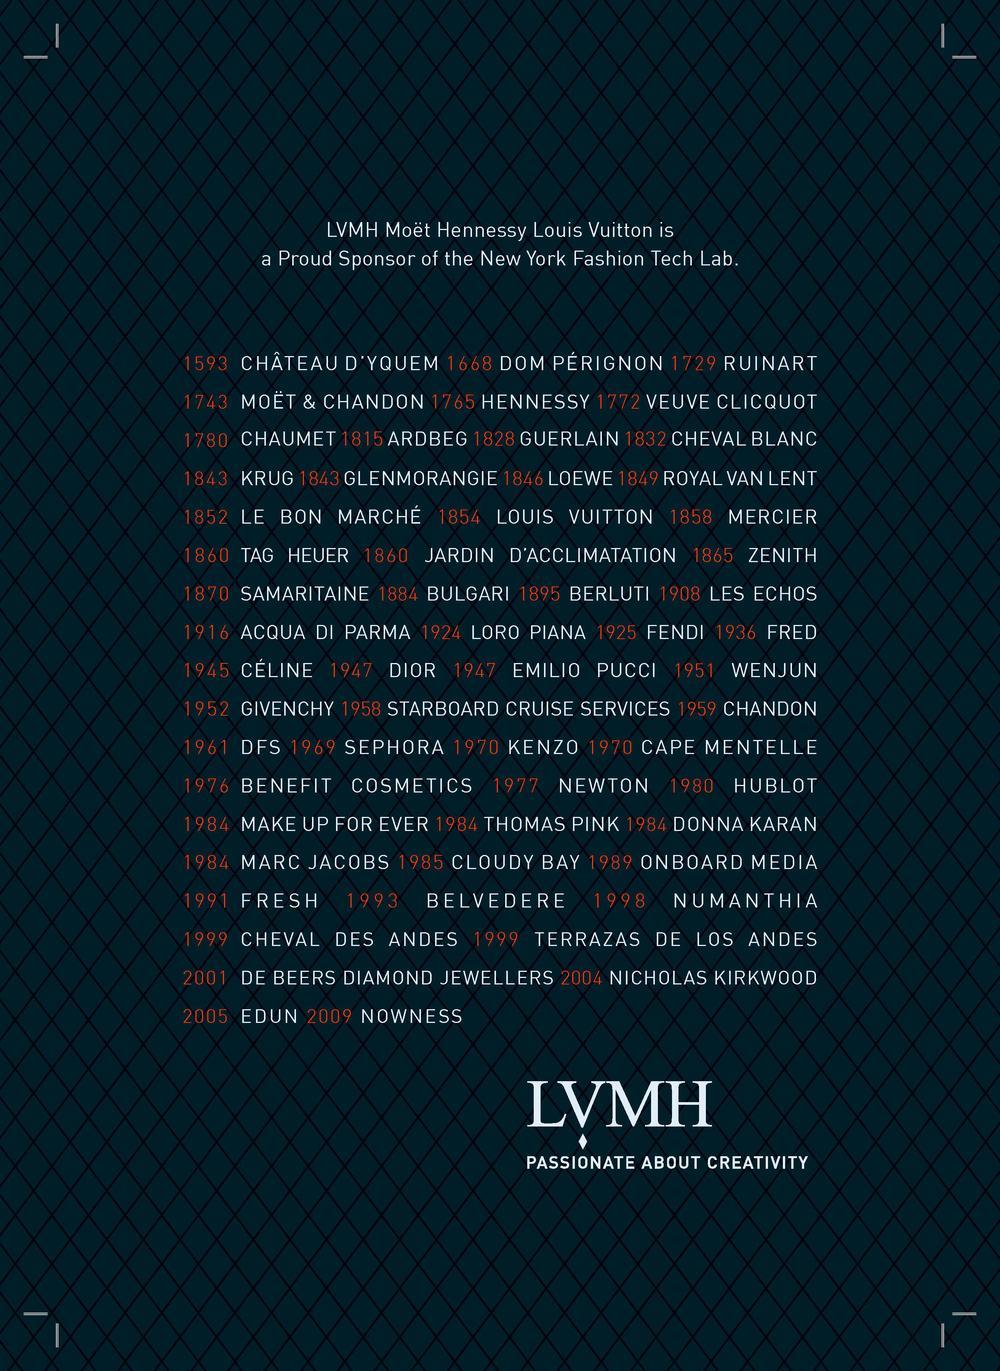 LVMV-NYFTL_CMJN_7.75-11_2014-06-23_12.L_-page1.jpg